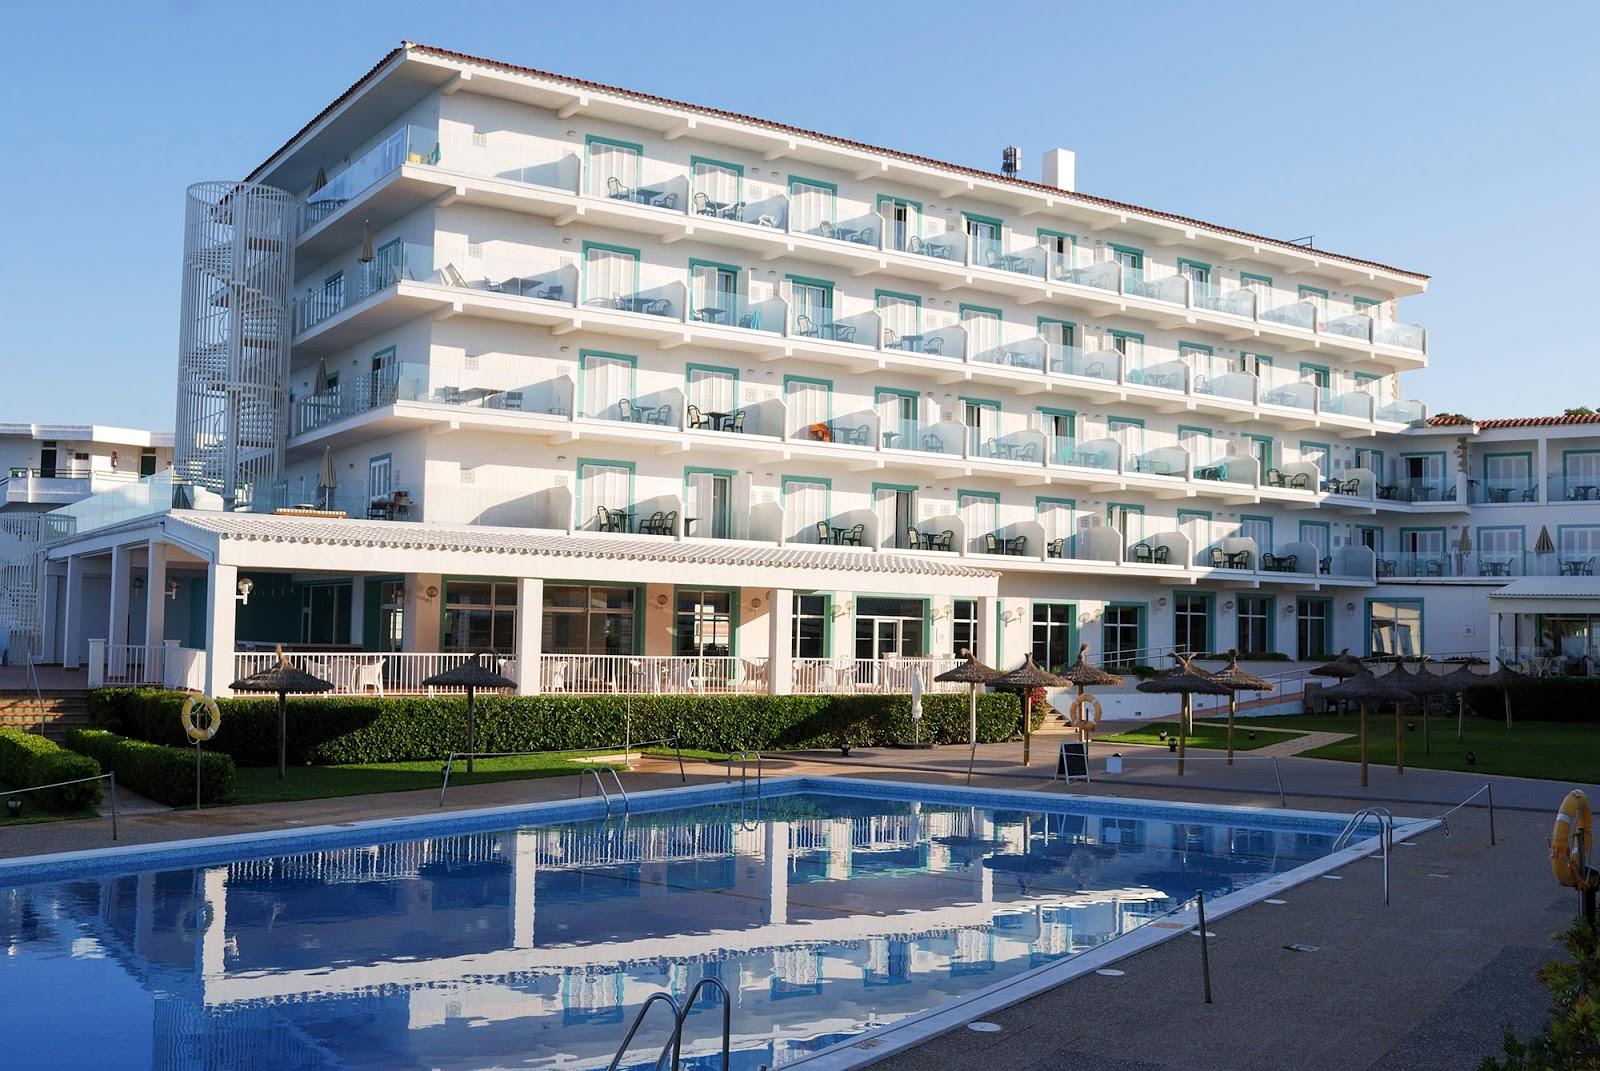 Sol Beach House Menorca Spain Melia Hotel rooms sea view swimming pool